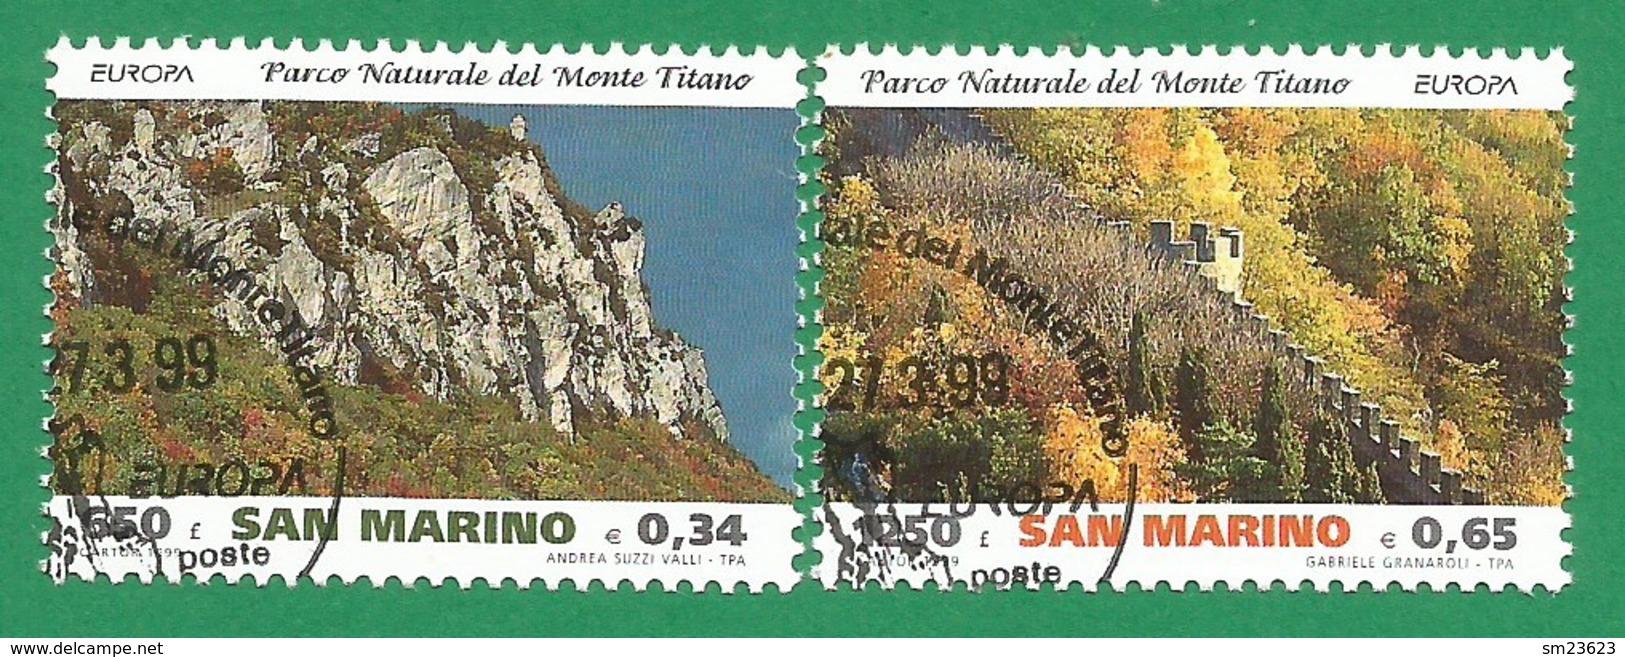 San Marino 1999  Mi.Nr. 1832 / 1833 , EUROPA CEPT  Natur- Und Nationalparks -  Gestempelt / Used / (o) - 1999